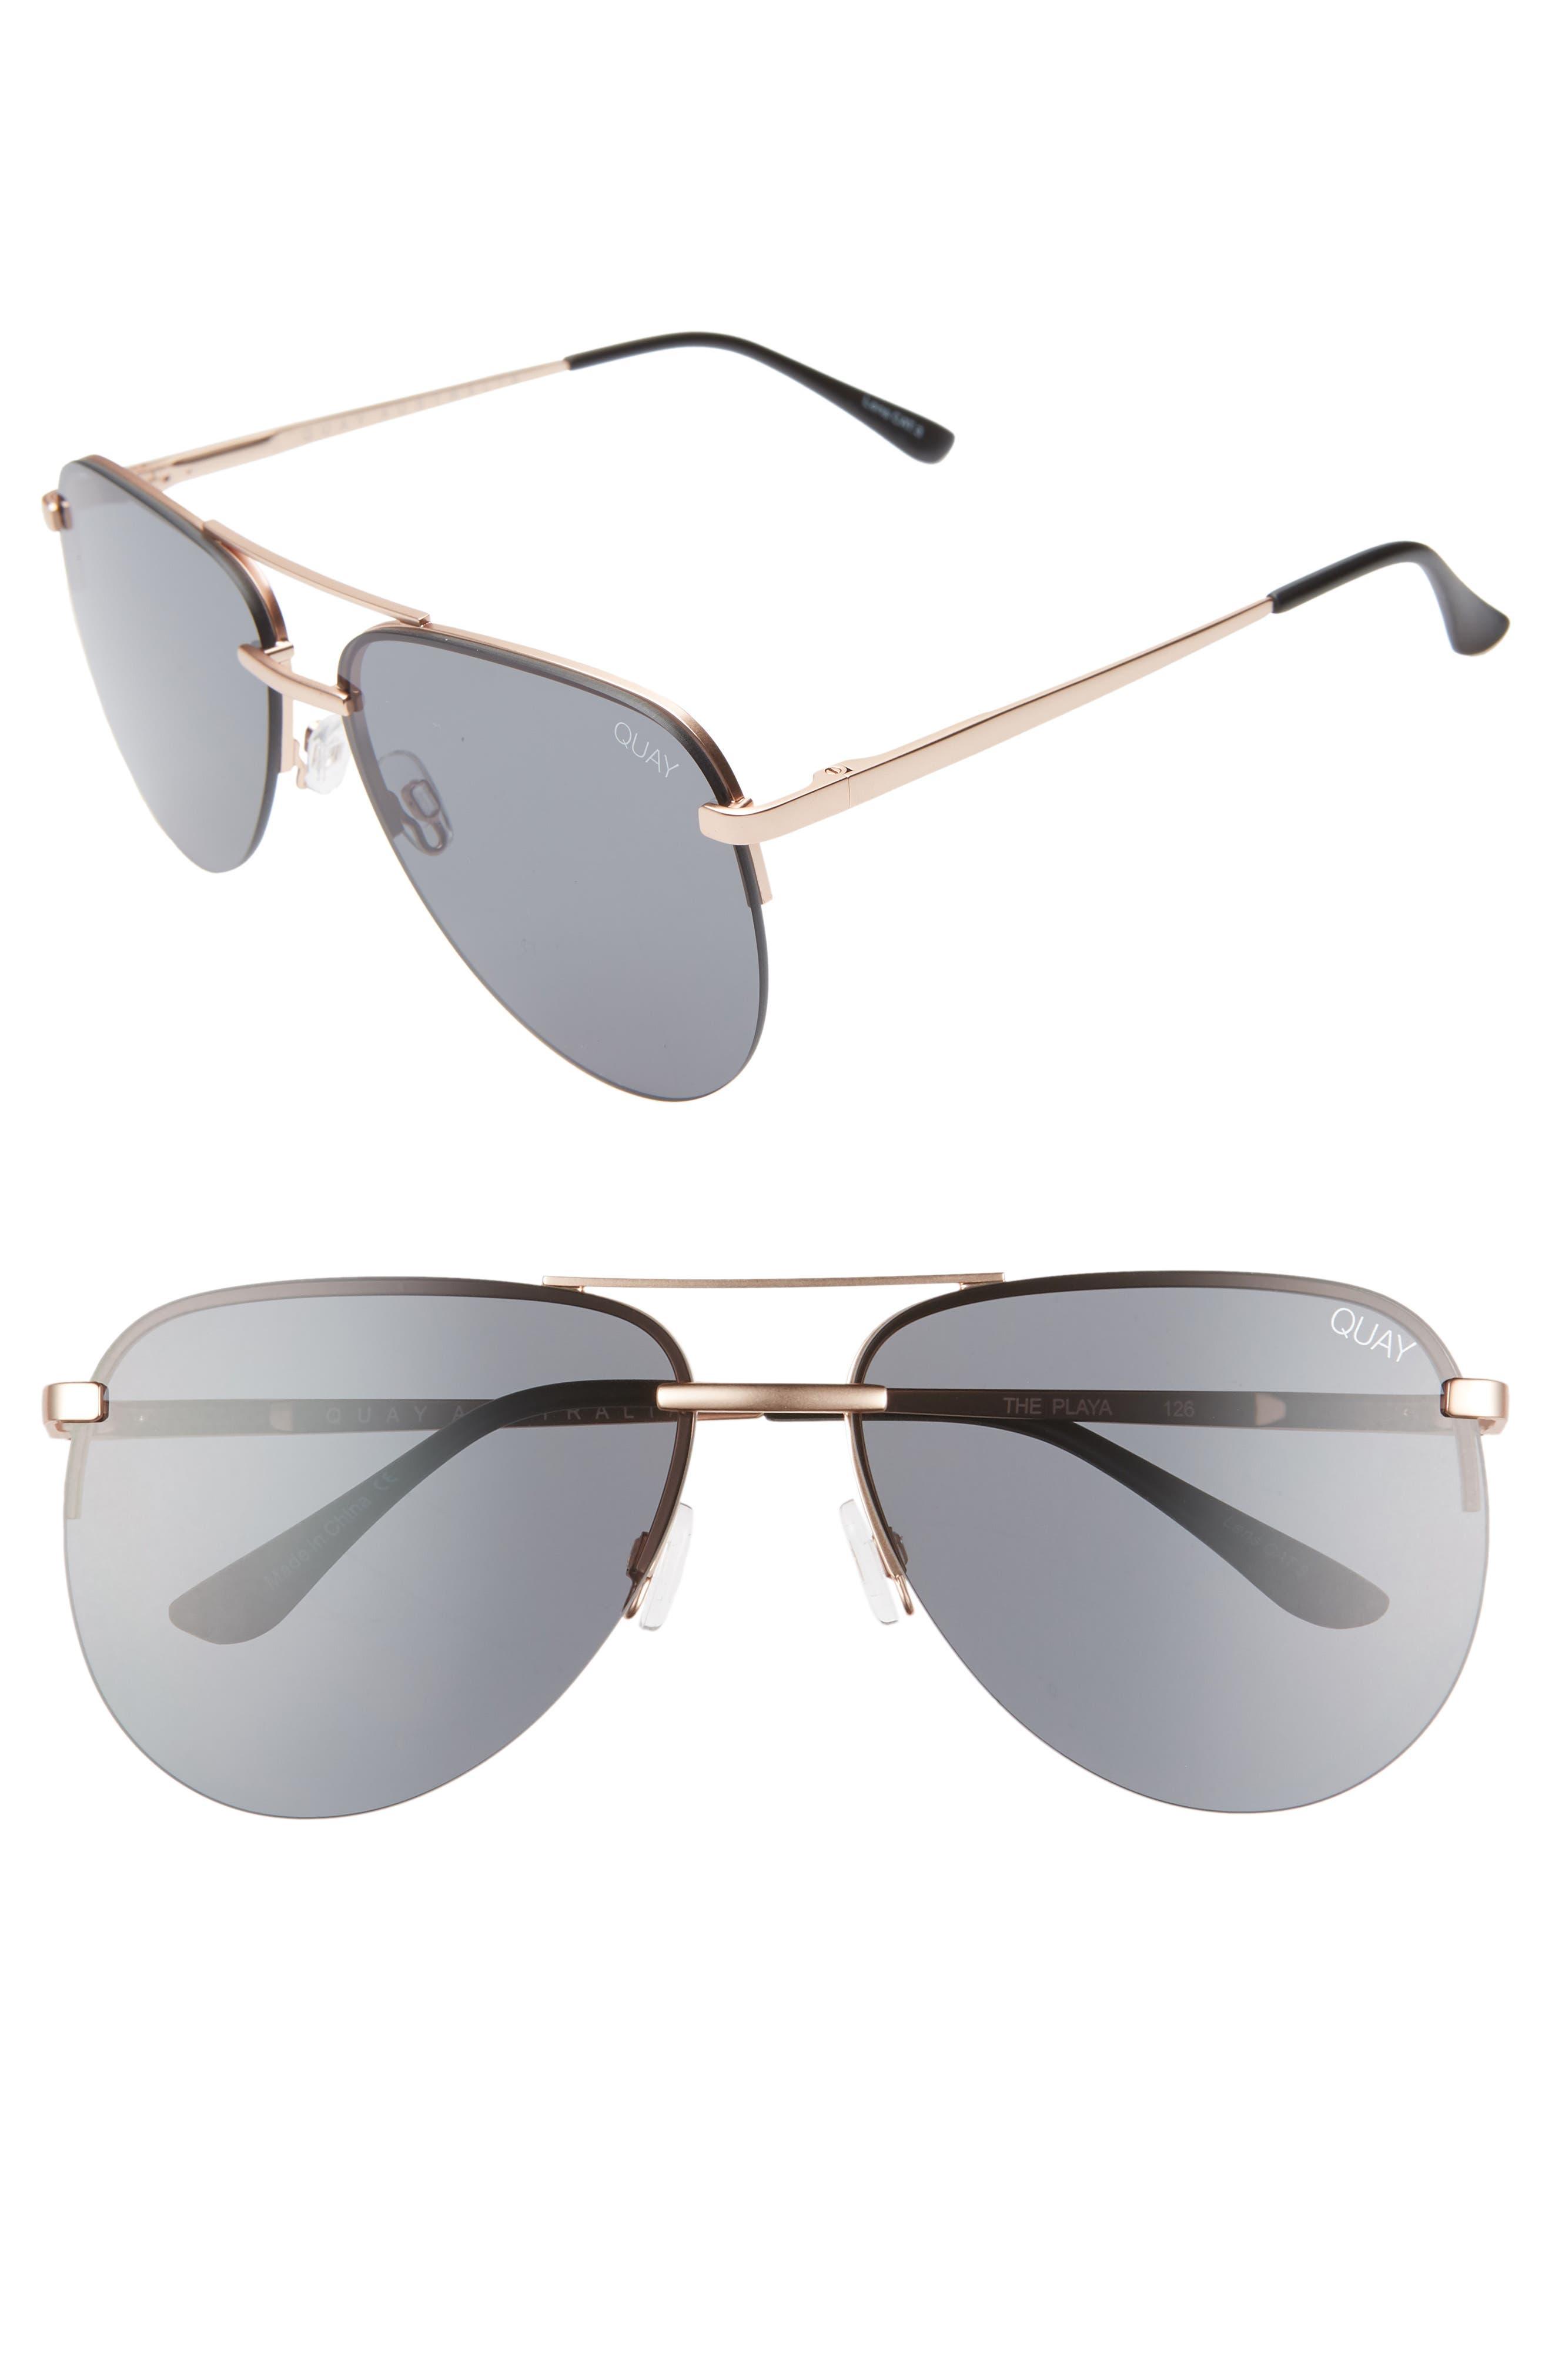 274c9d6631 Quay Australia Sunglasses for Women